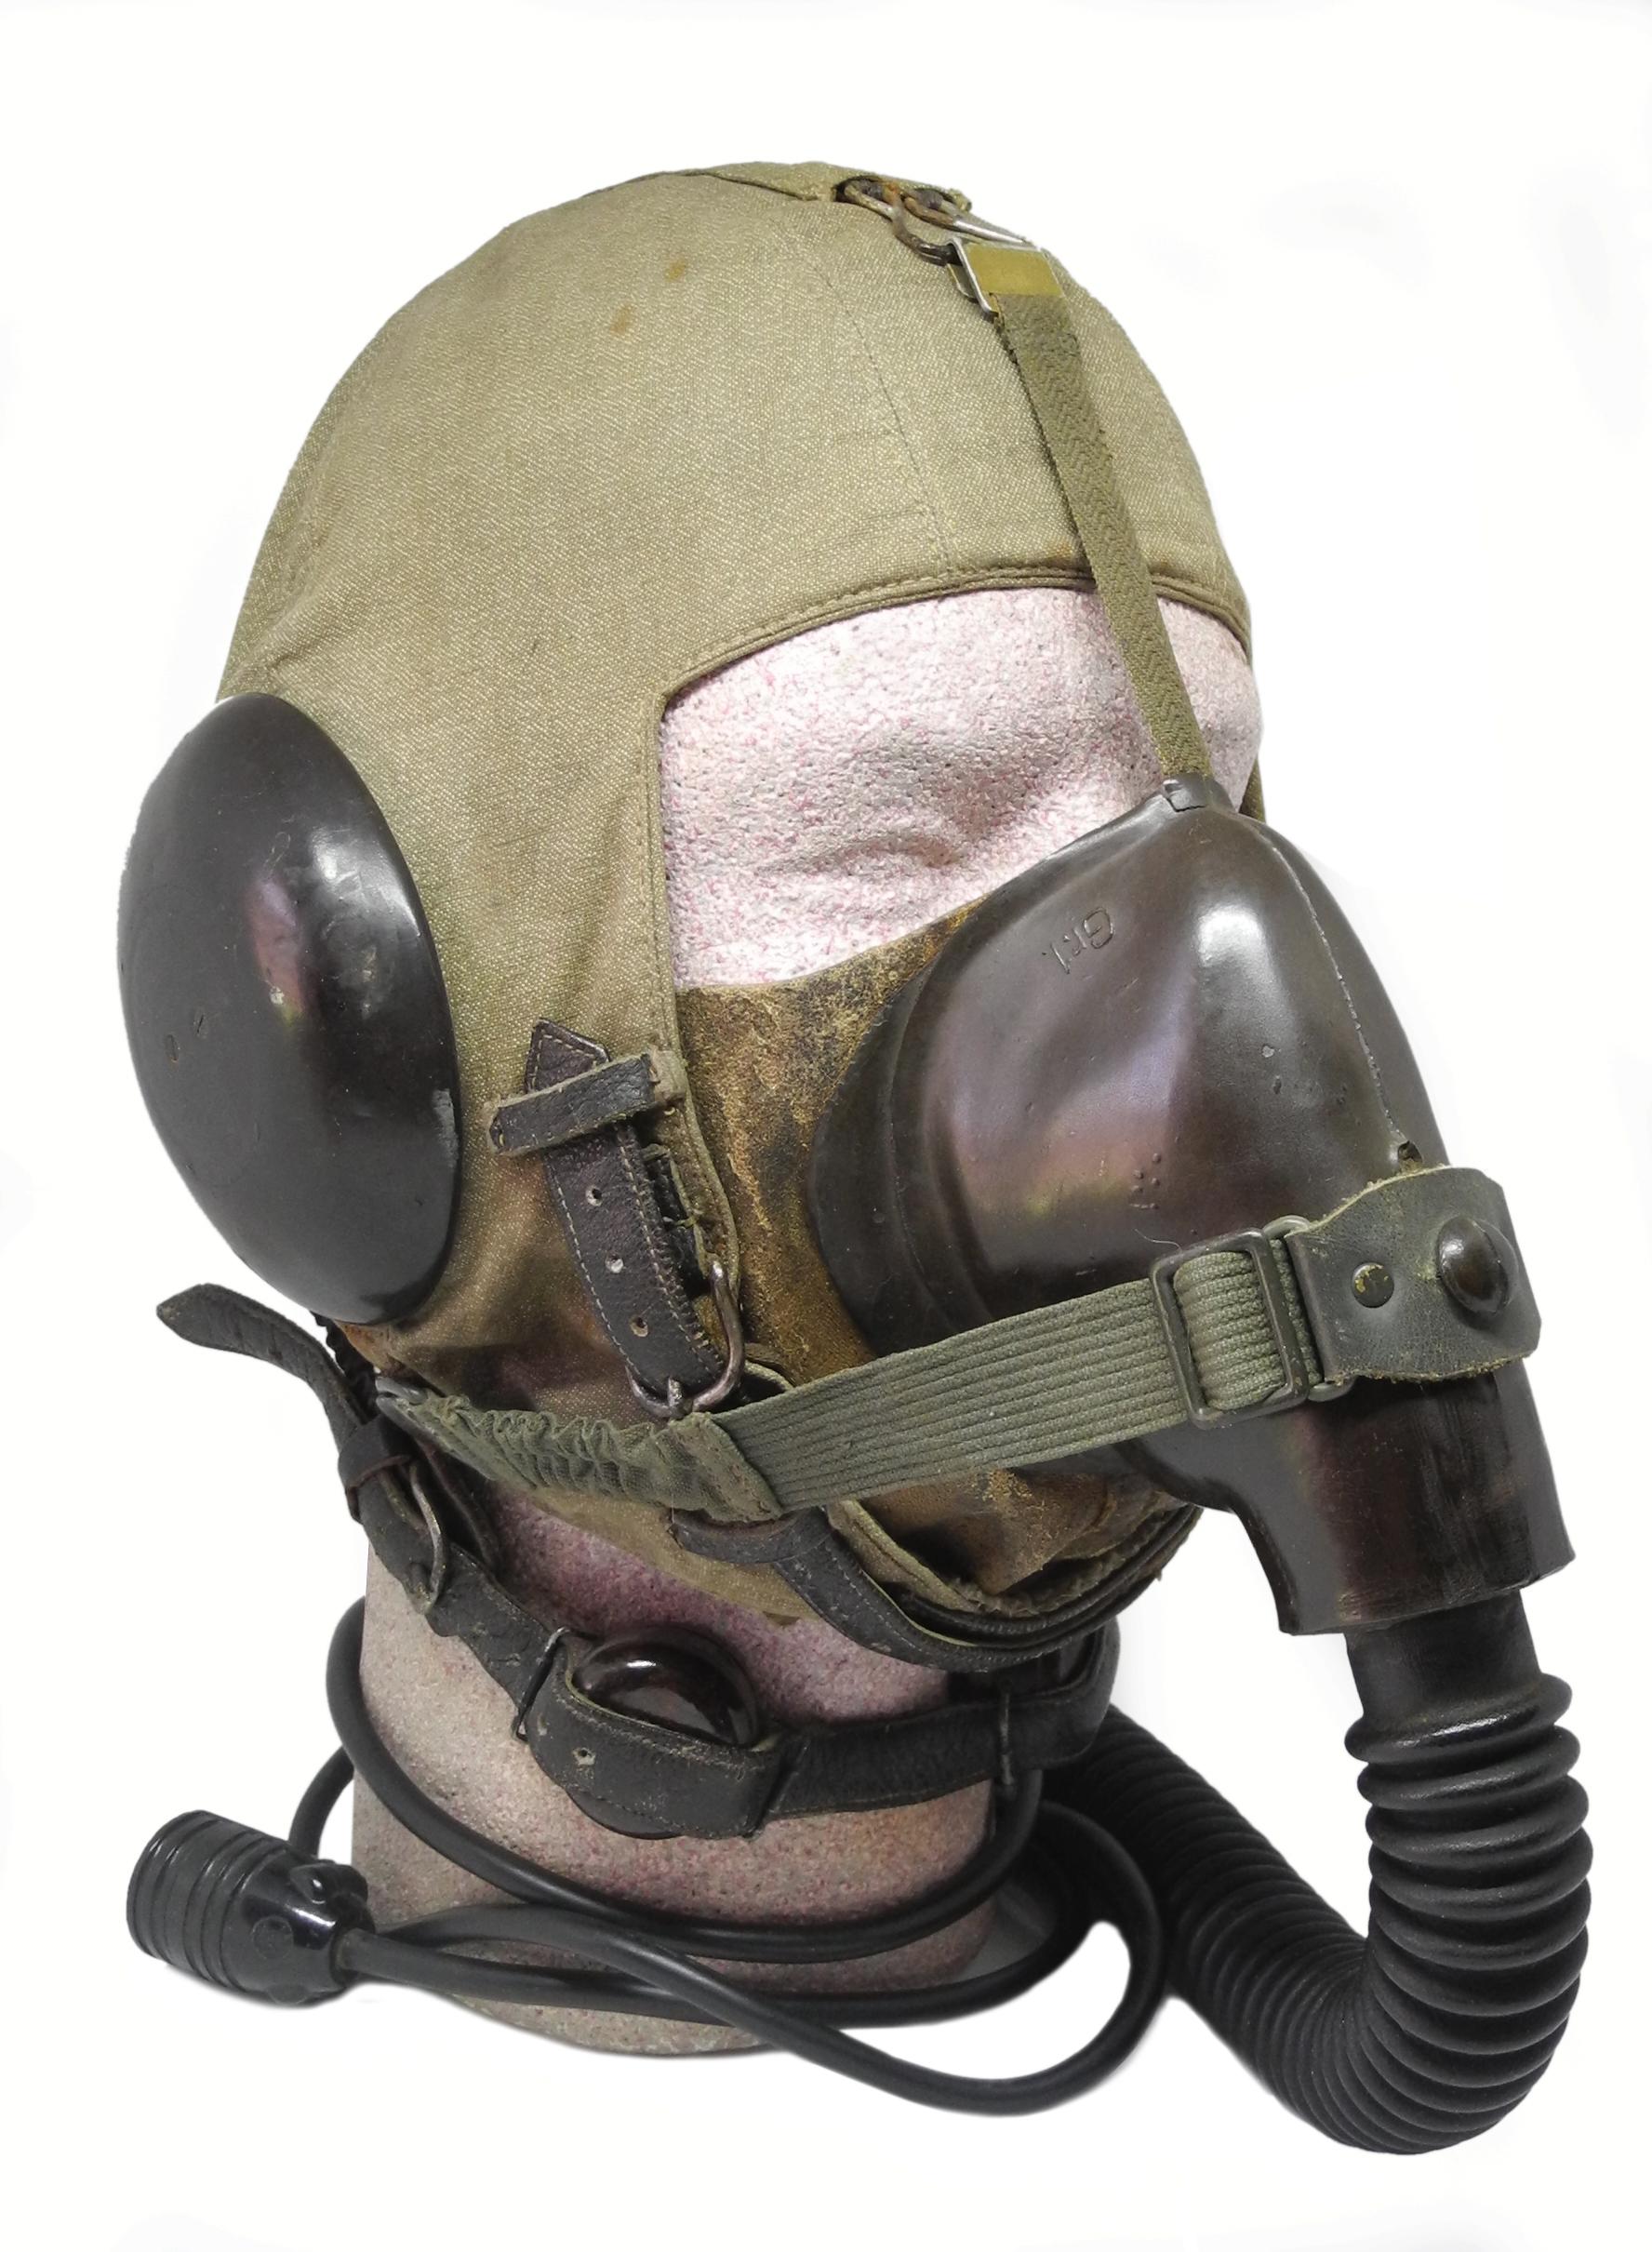 LW 10-67 3-strap oxygen mask